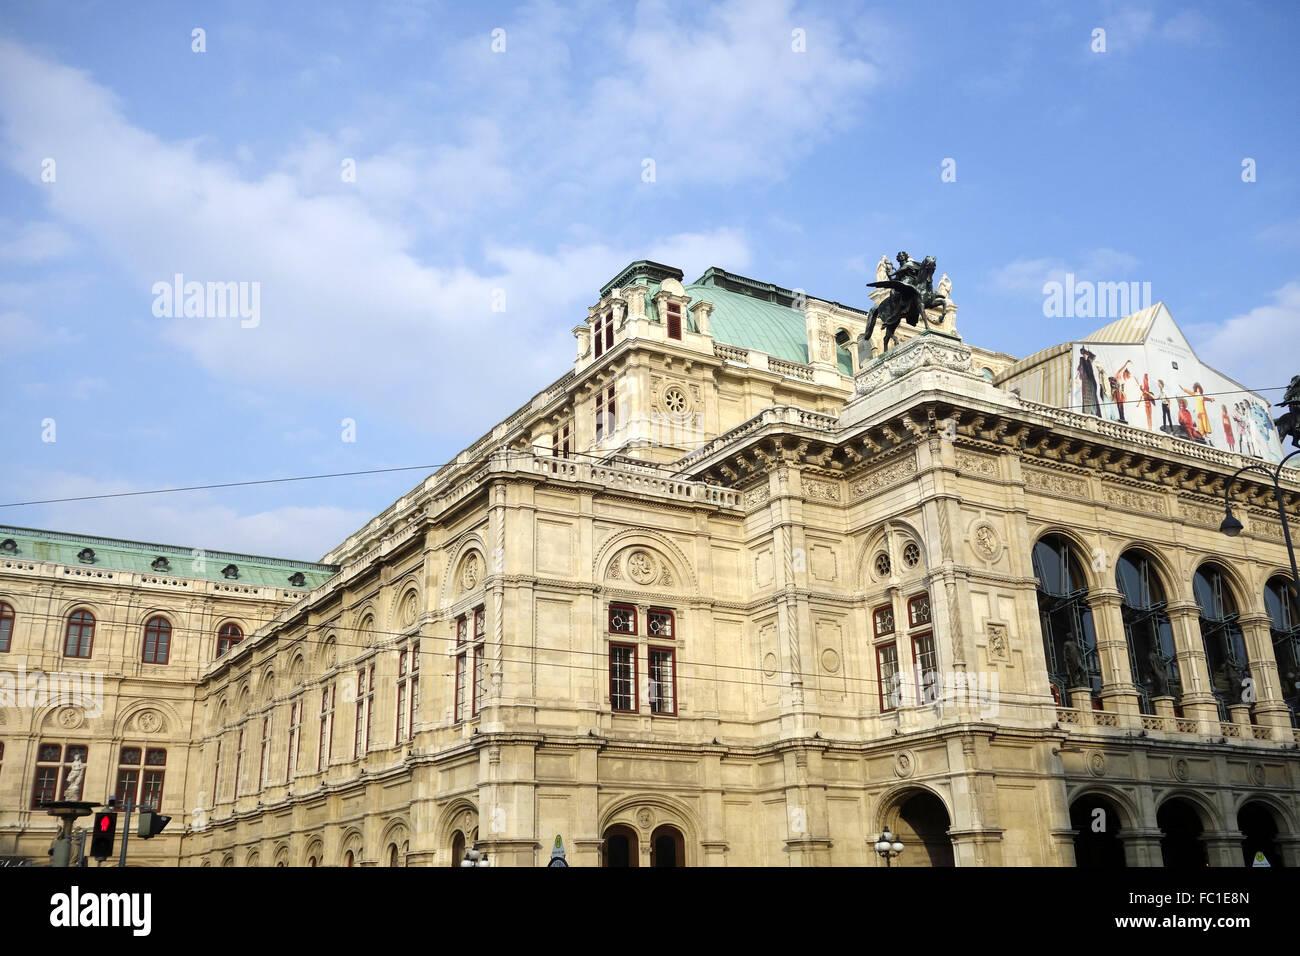 vienna state opera - Stock Image